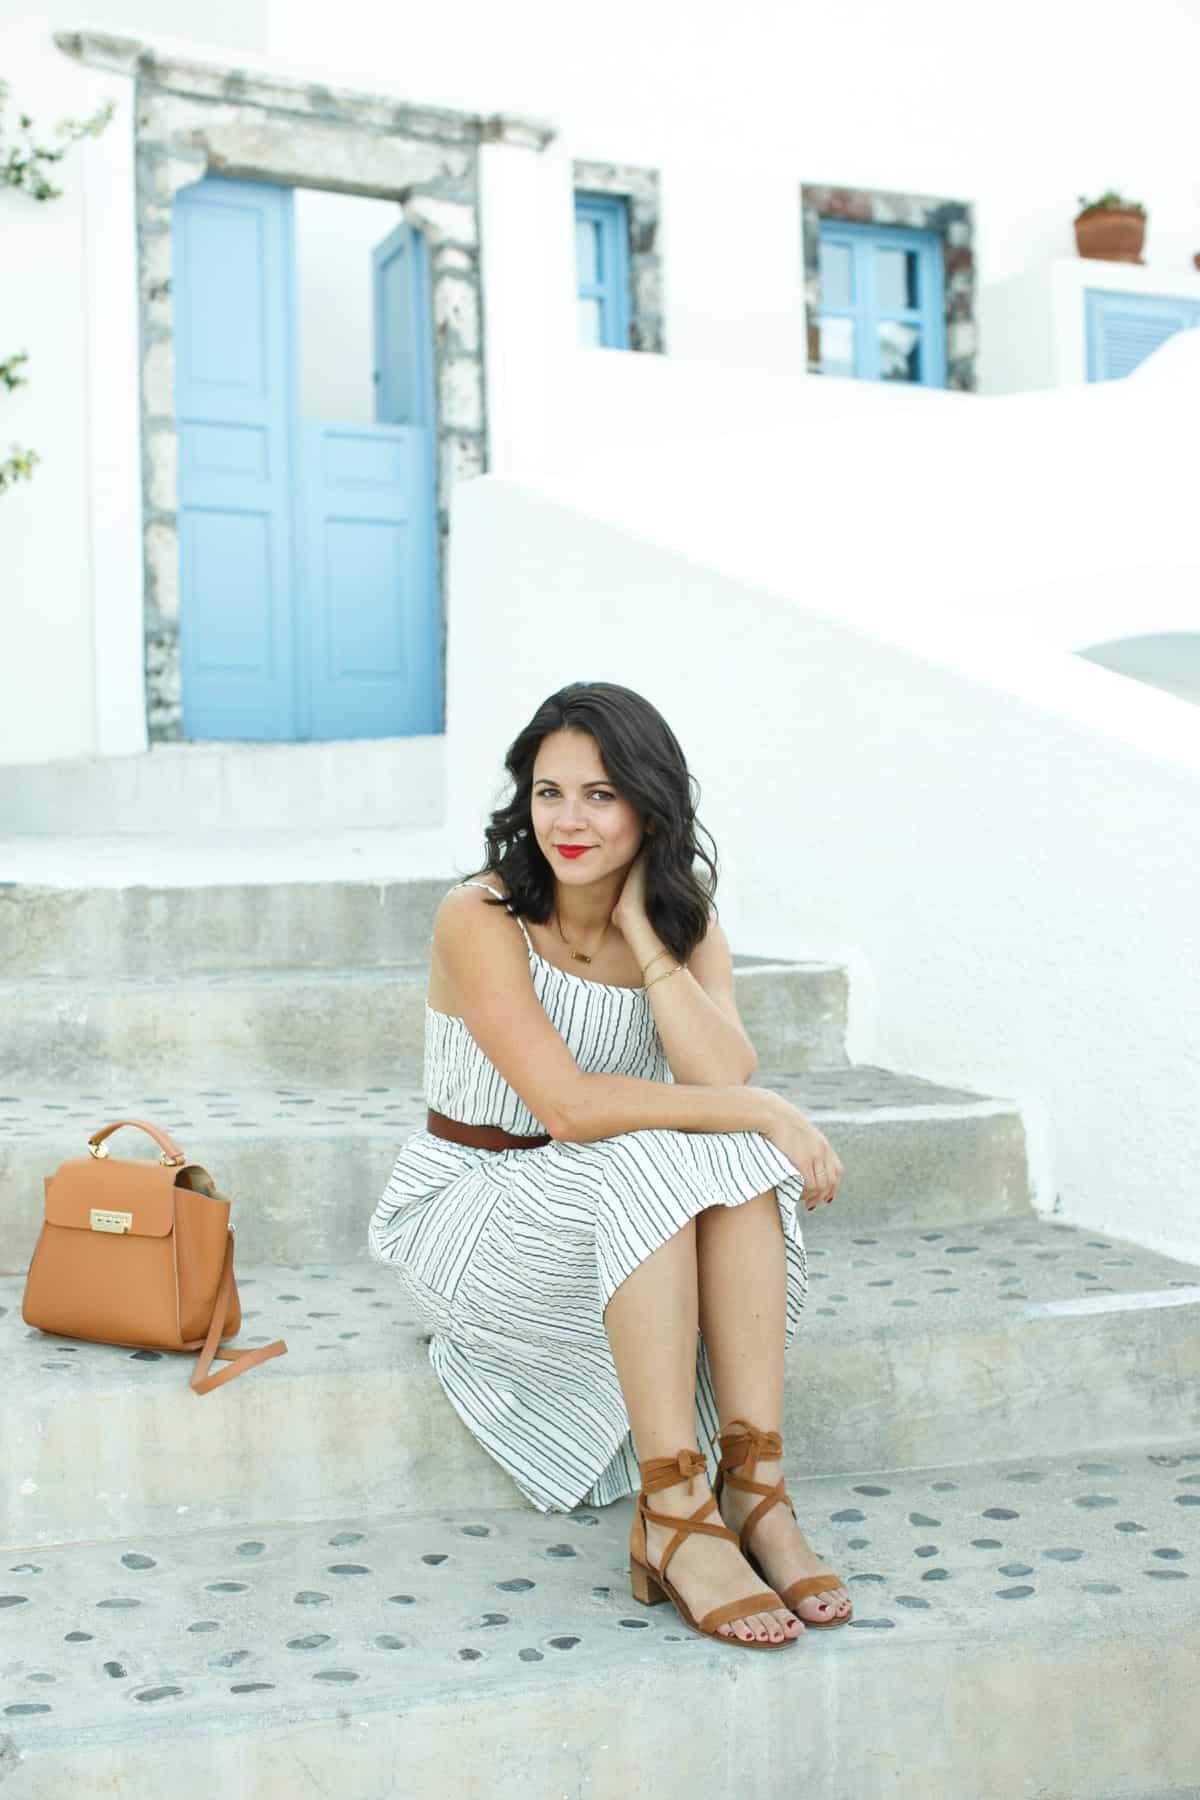 Michael Stars striped midi dress - - What to wear on vacation, Greece outfit ideas - My Style Vita @mystylevita